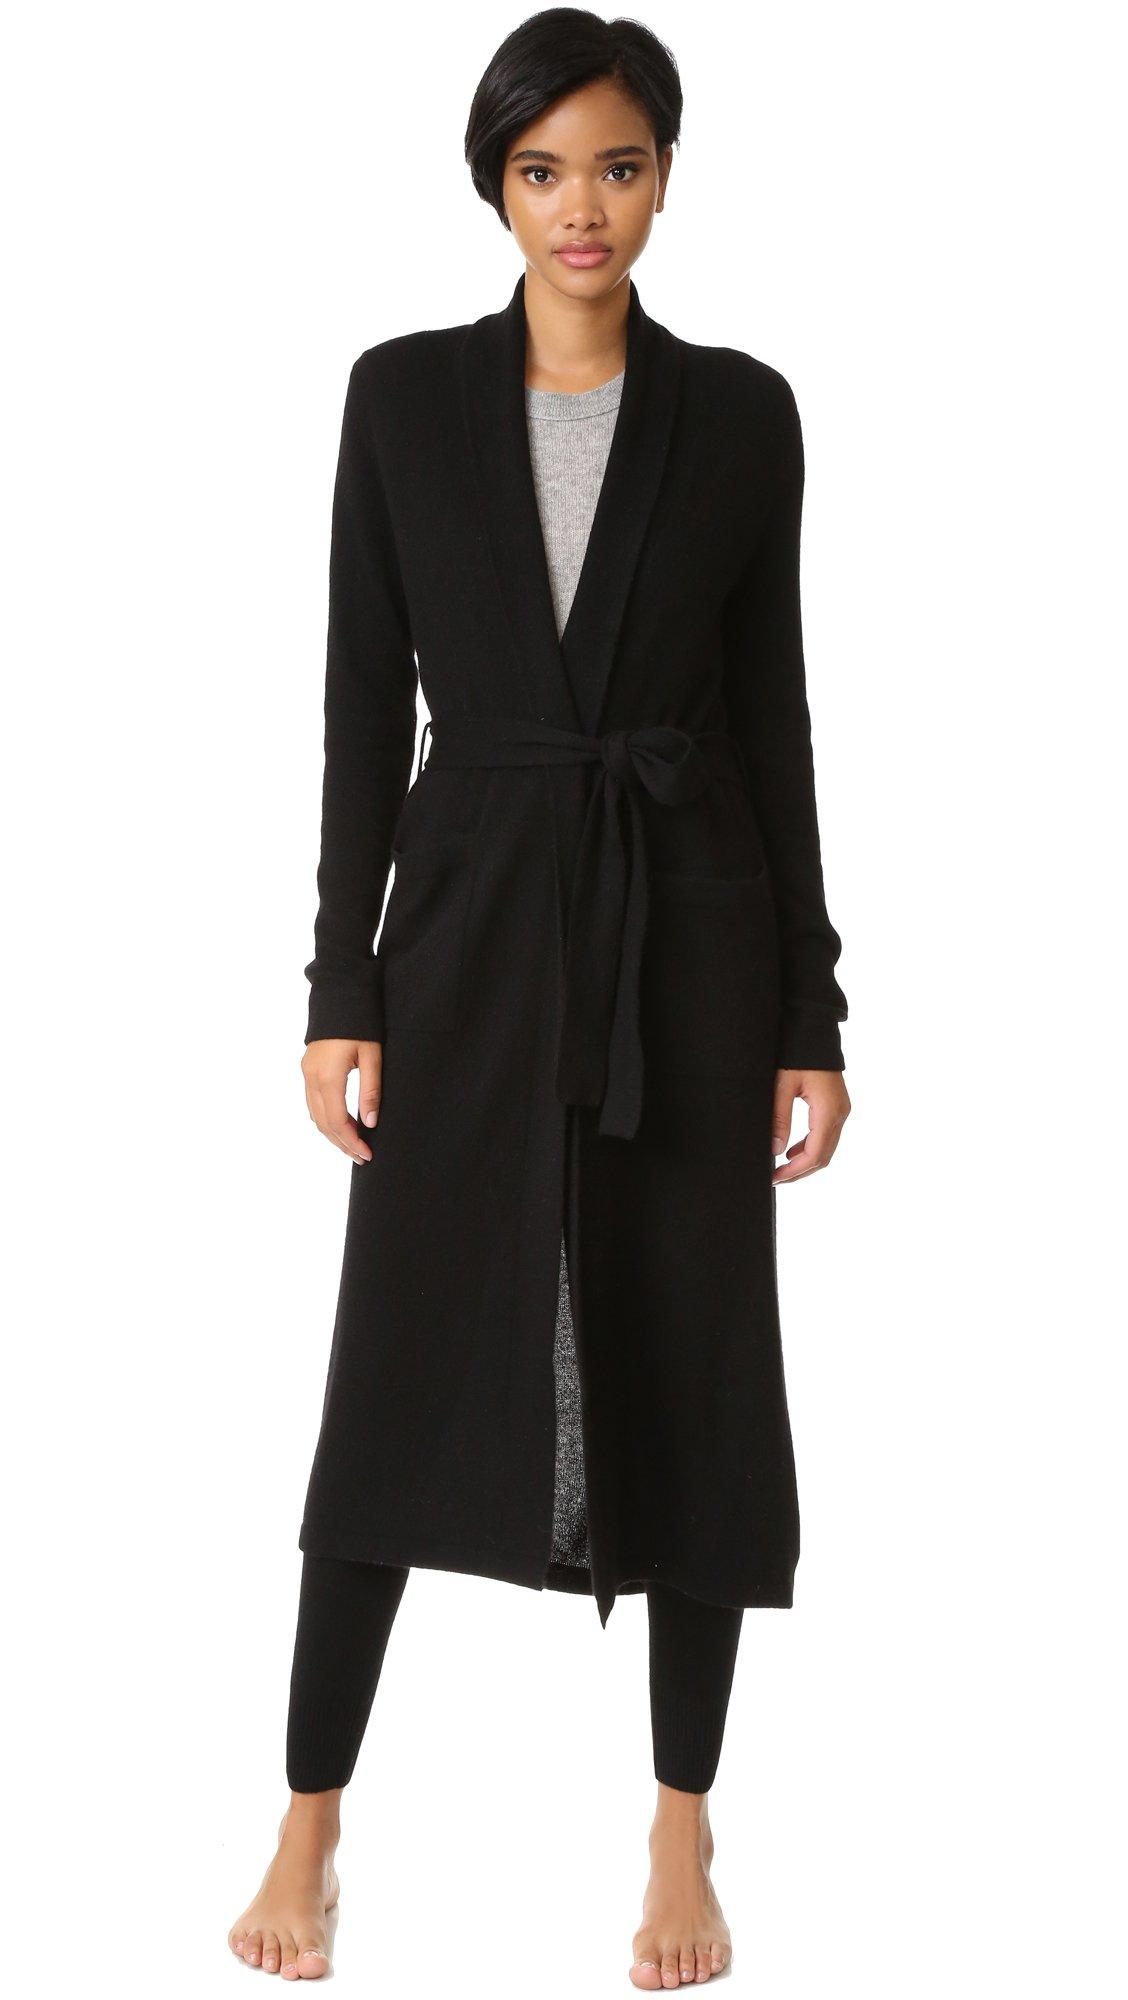 White + Warren Women's Luxe Cashmere Robe, Black, Large